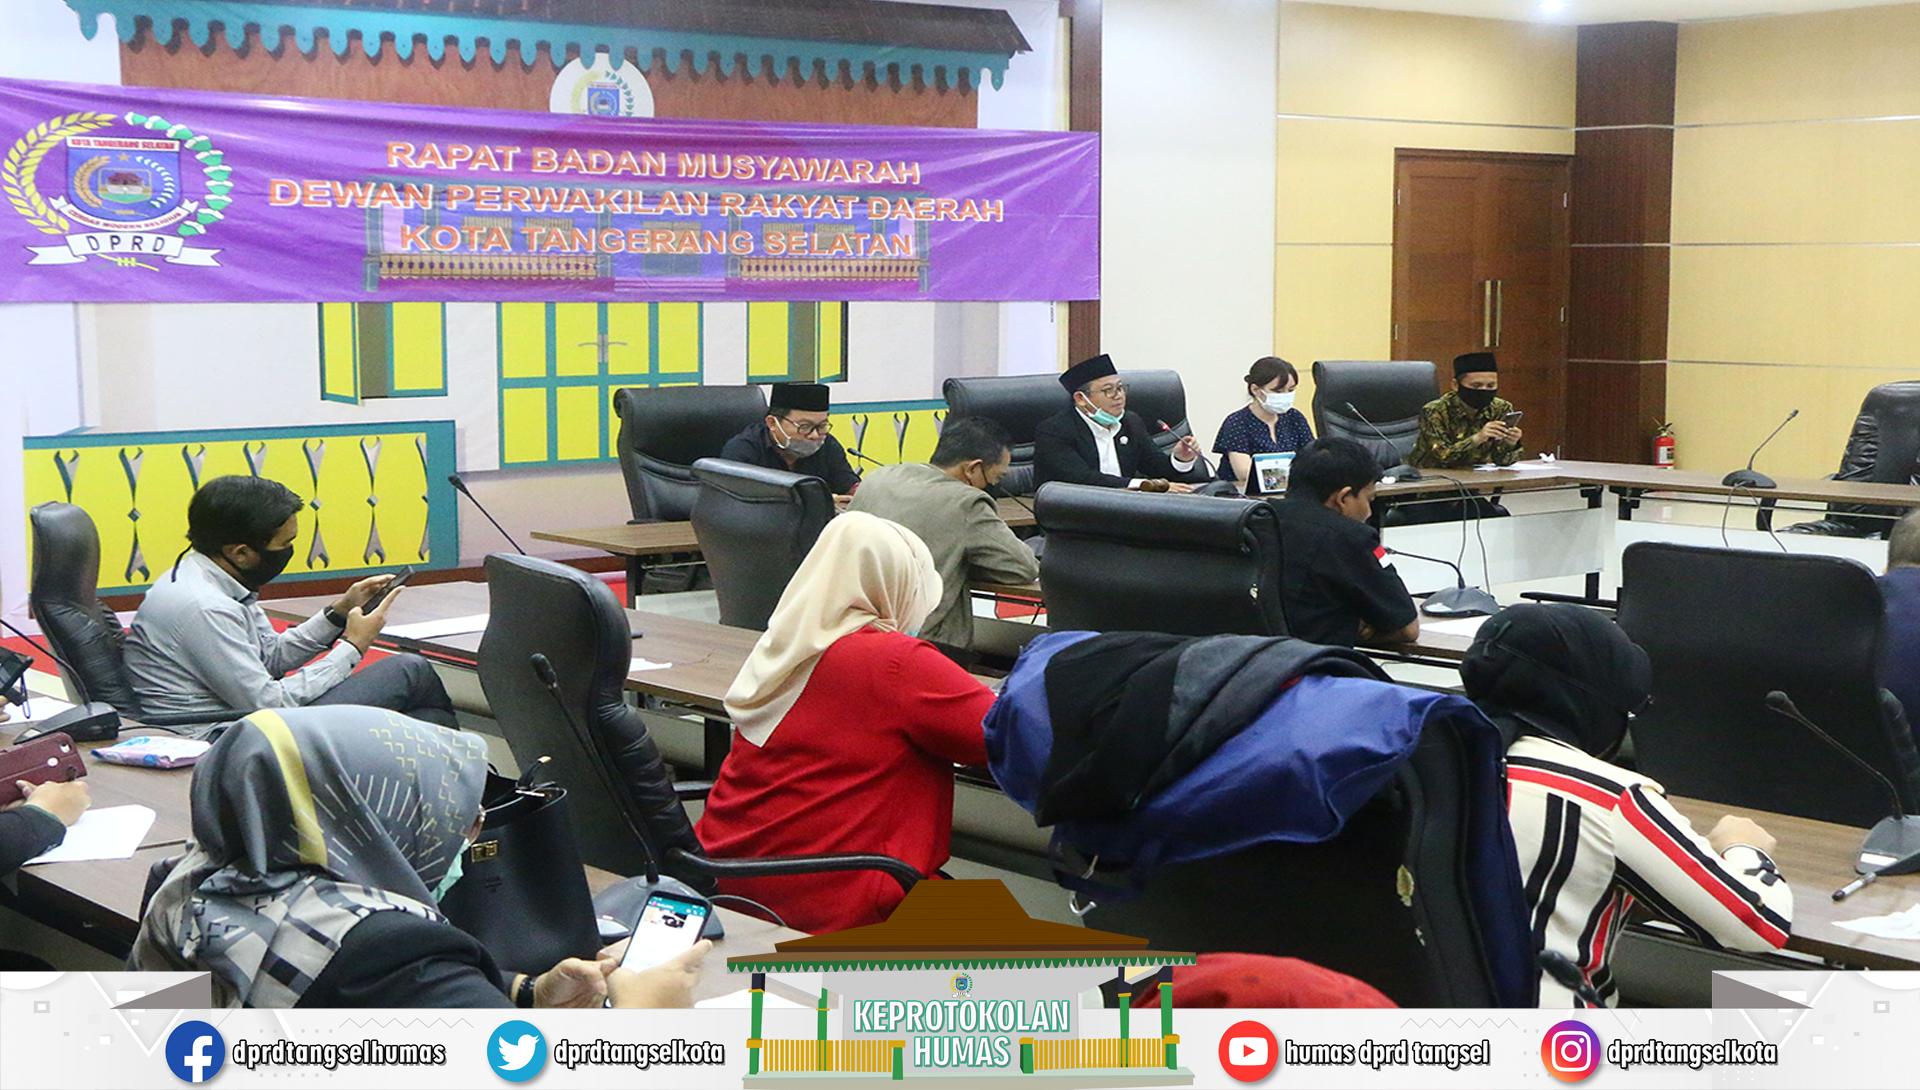 Rapat Banmus mengenai Penjadwalan Kegiatan Alat Kelengkapan Dewan